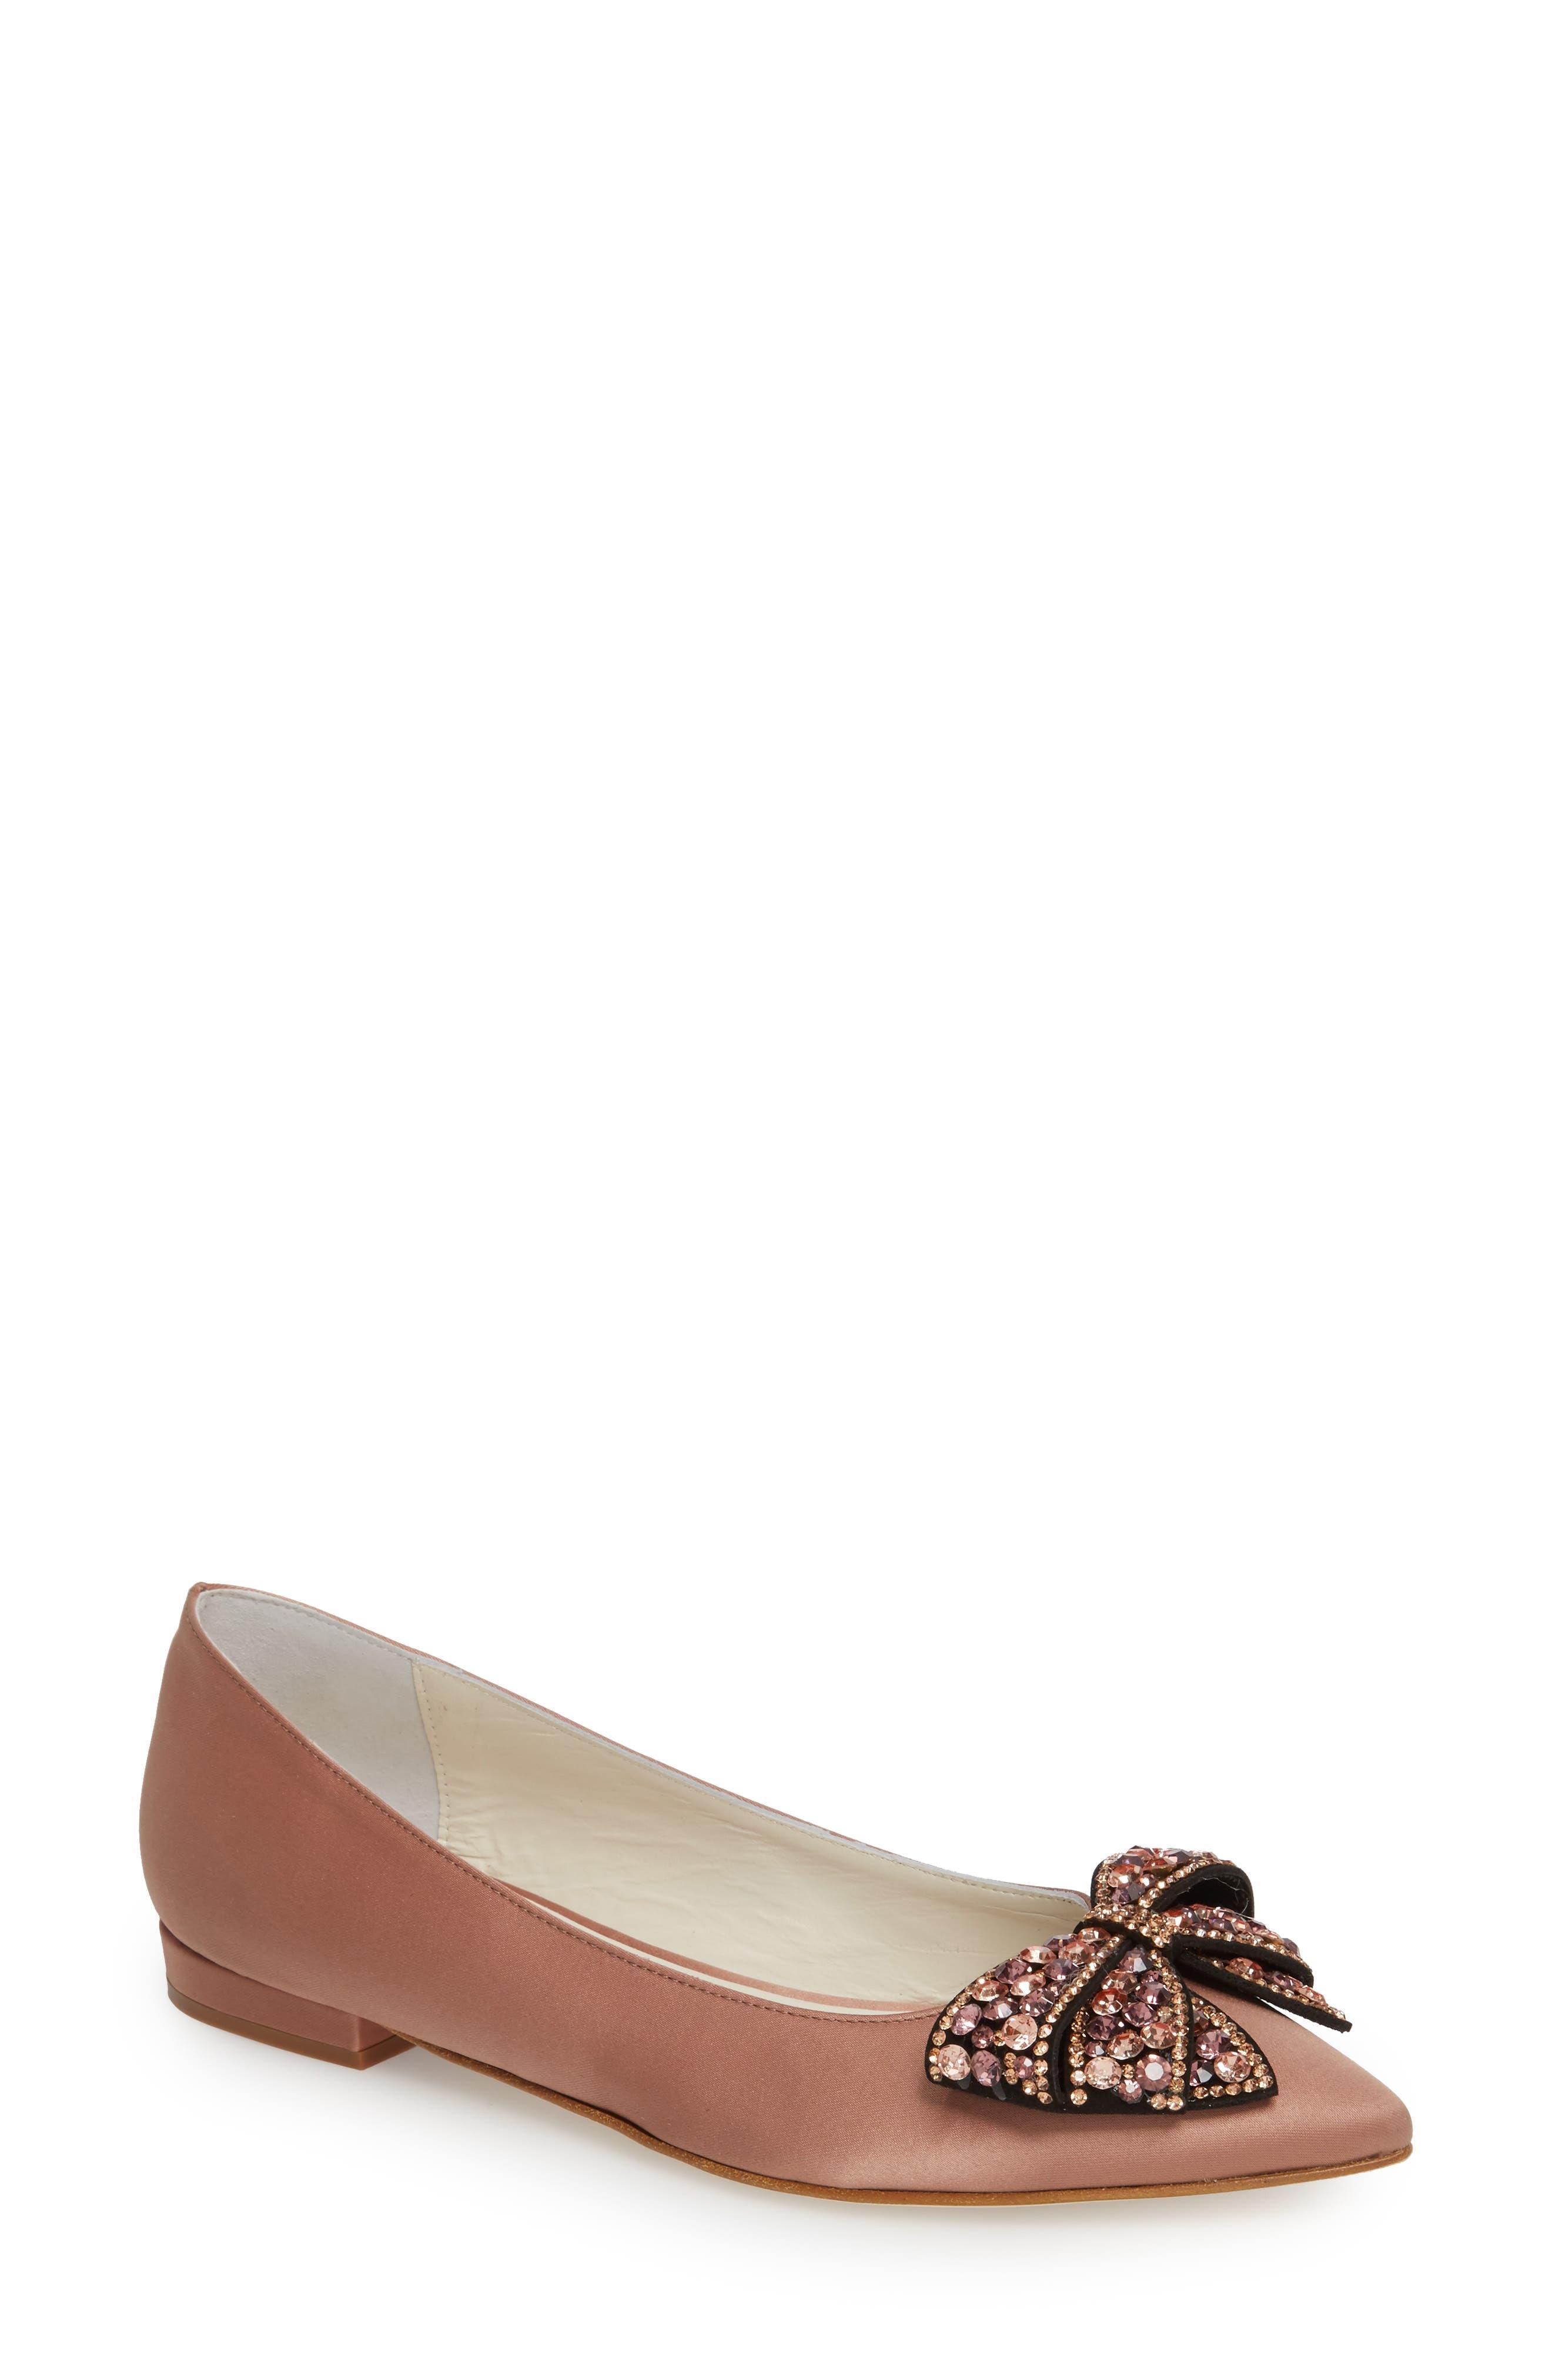 Milva Embellished Bow Pointy Toe Flat,                         Main,                         color, Blush Satin